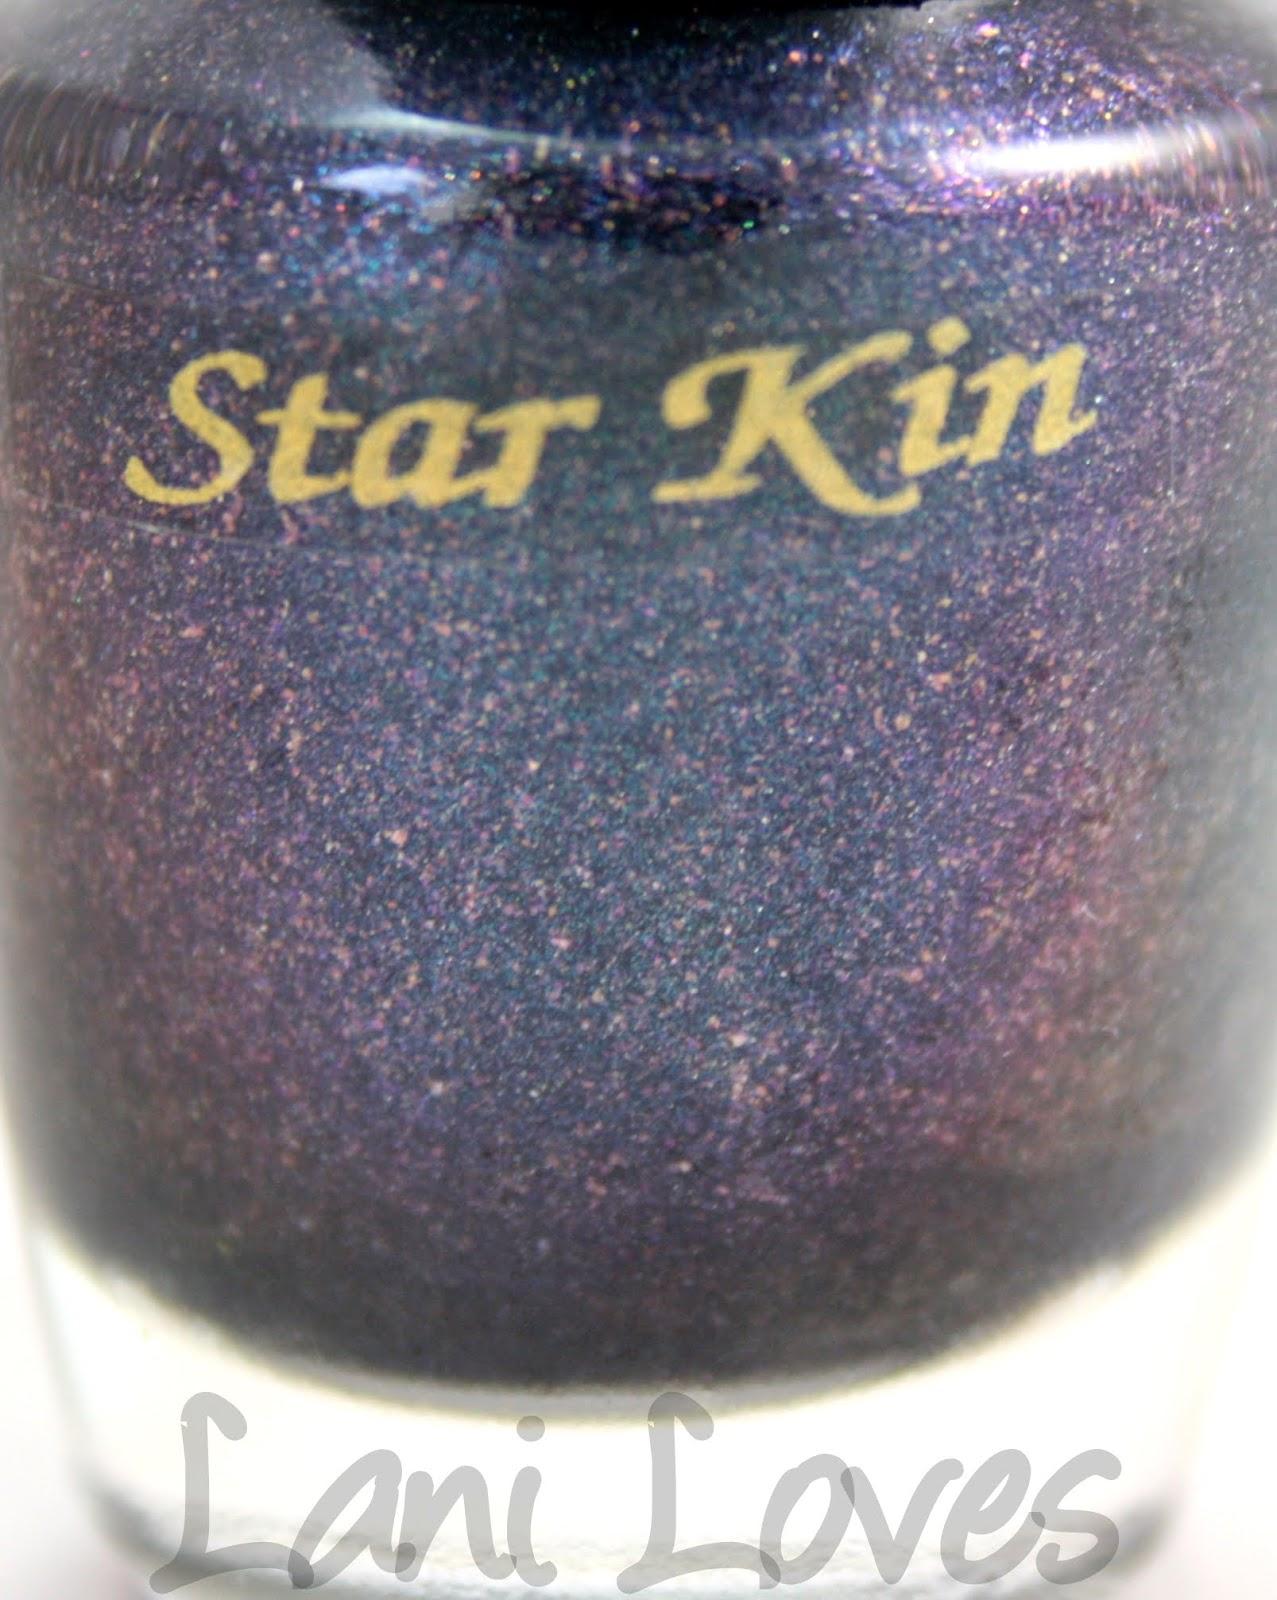 Star Kin Orion